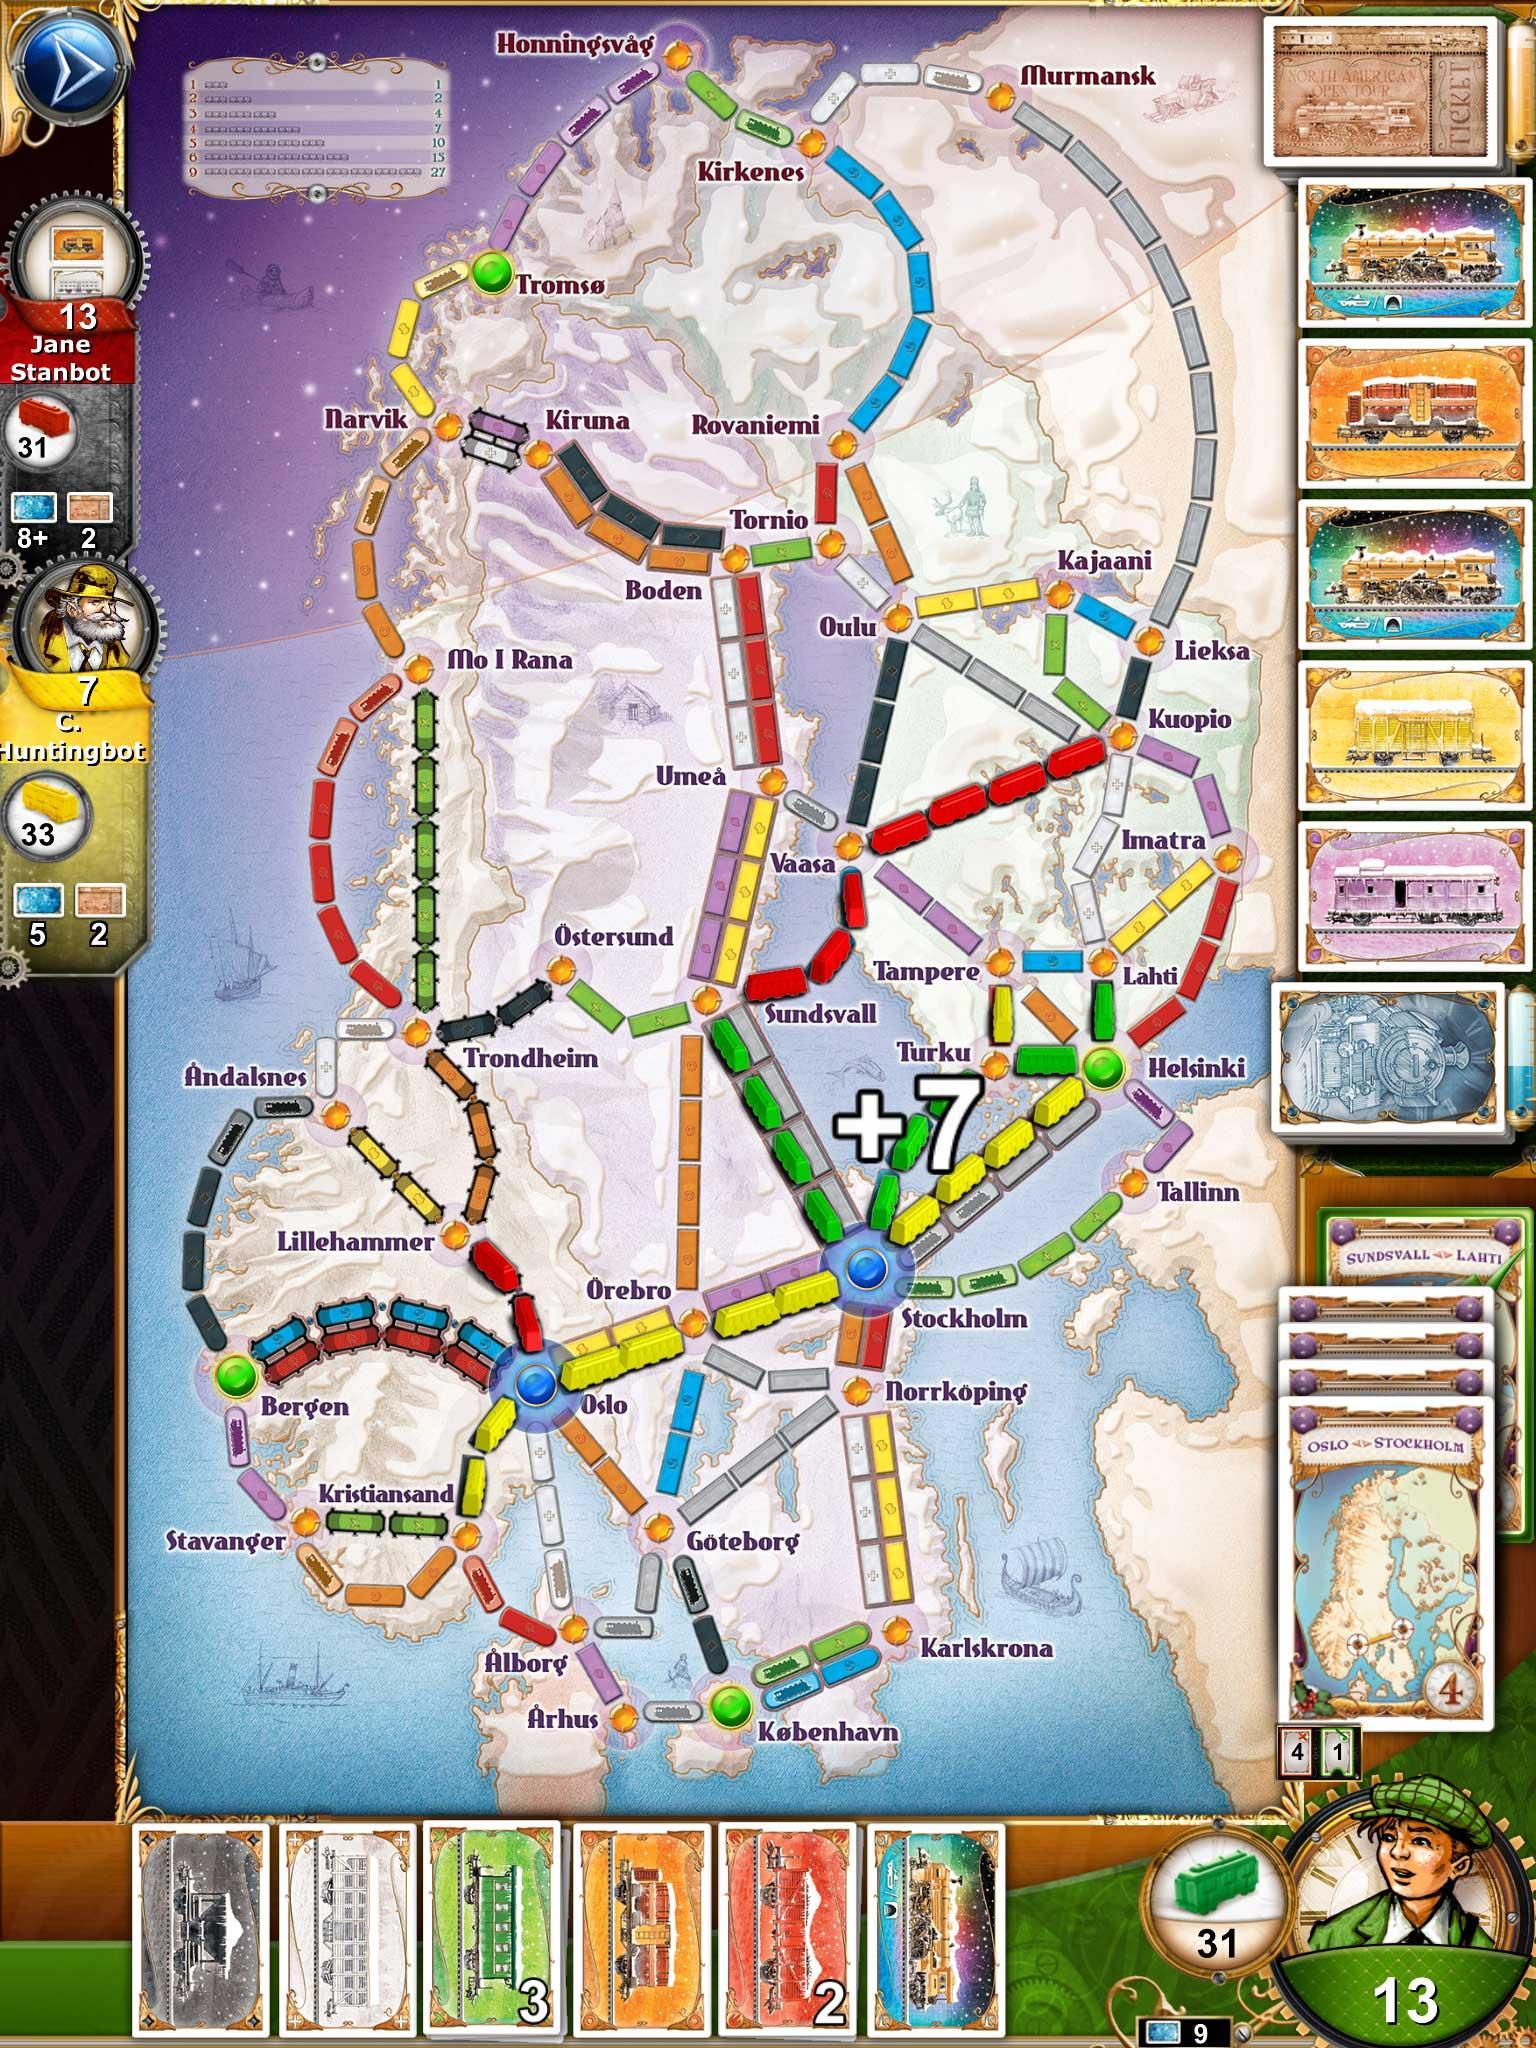 Ticket to Ride screenshot #13